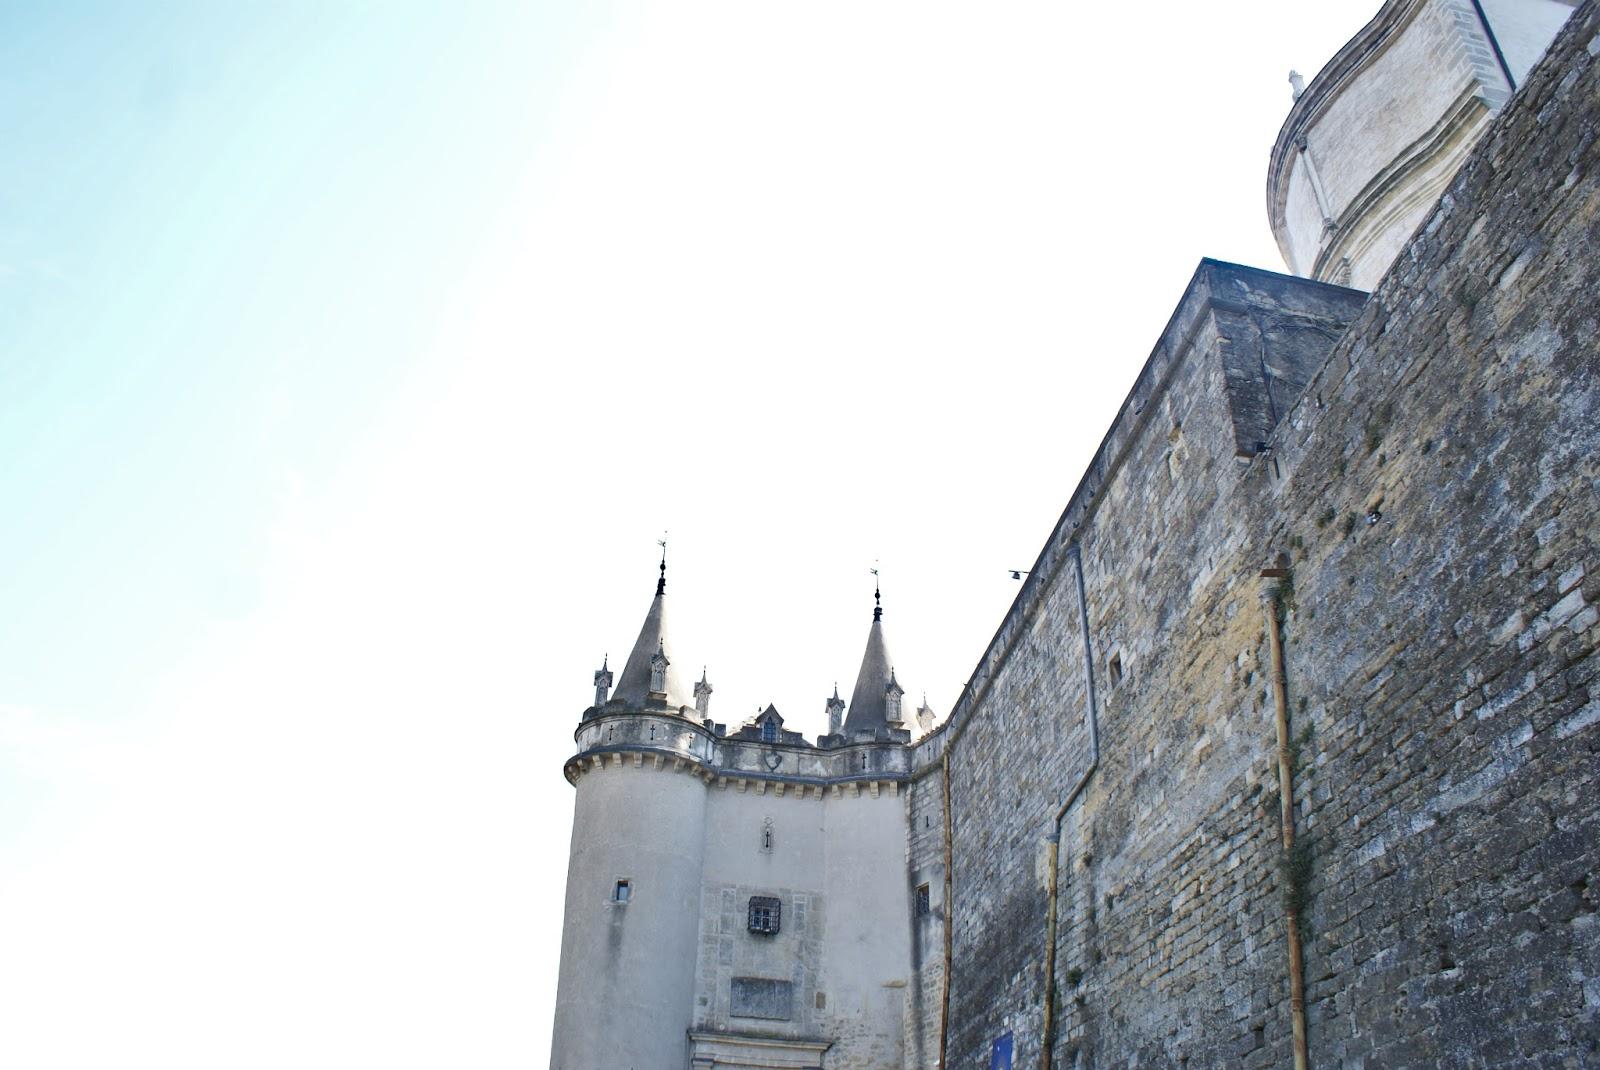 grignan drome provence rhone alpes france chateau